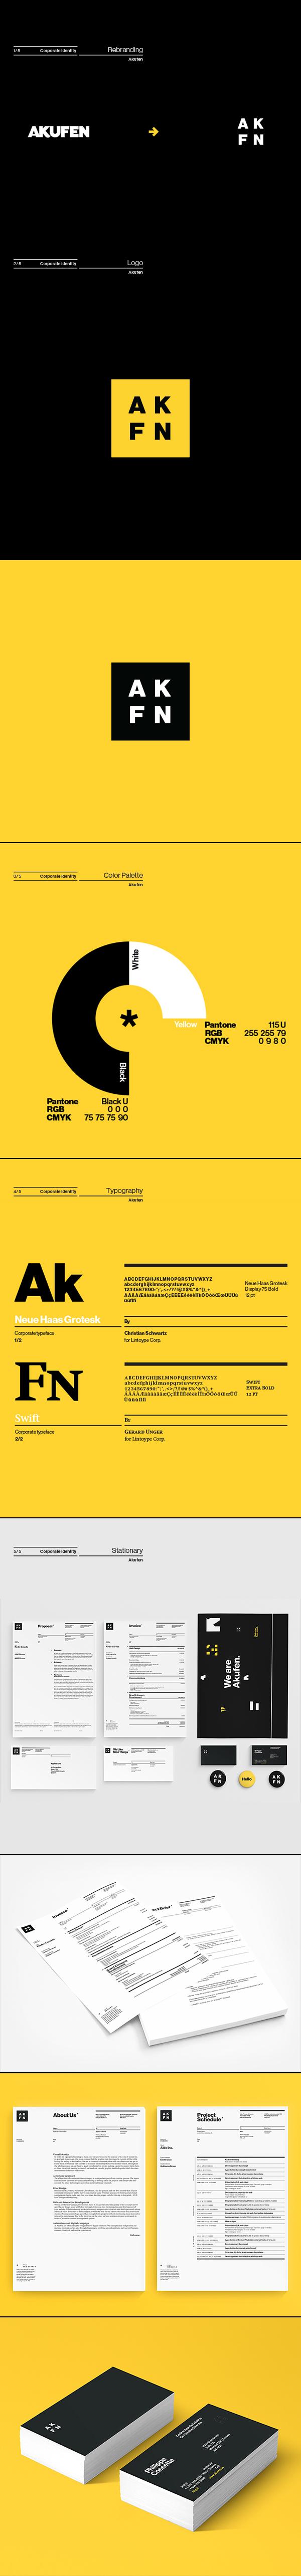 Akufen branding by Etienne Vles, via Behance